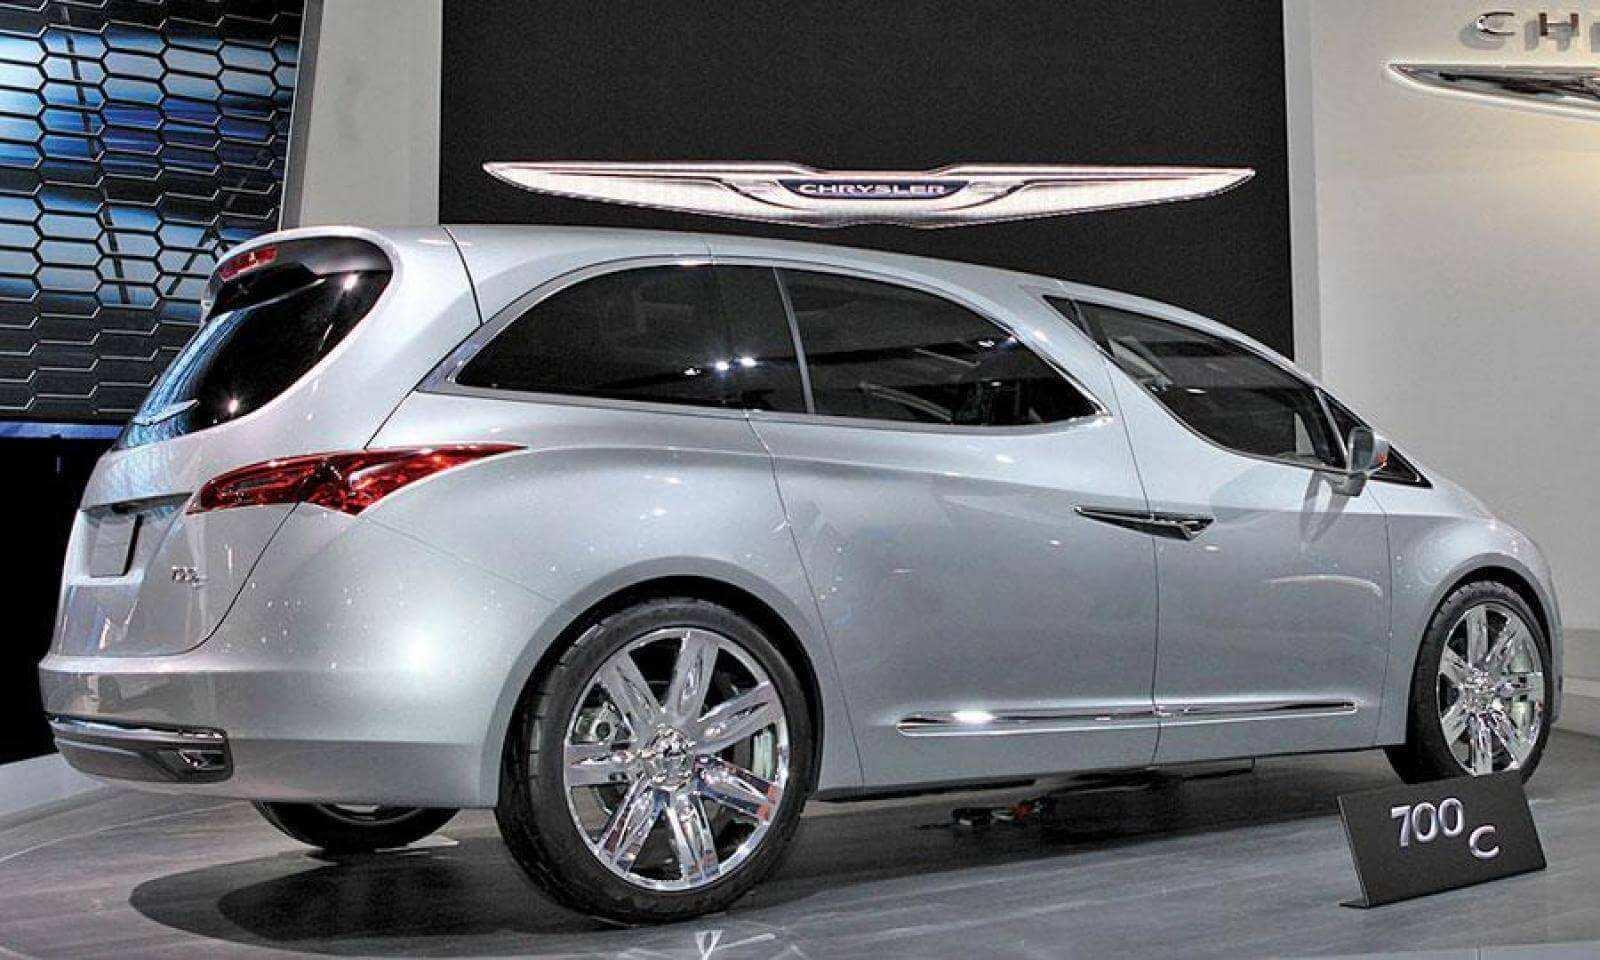 67 Concept of 2020 Chrysler Town Price for 2020 Chrysler Town